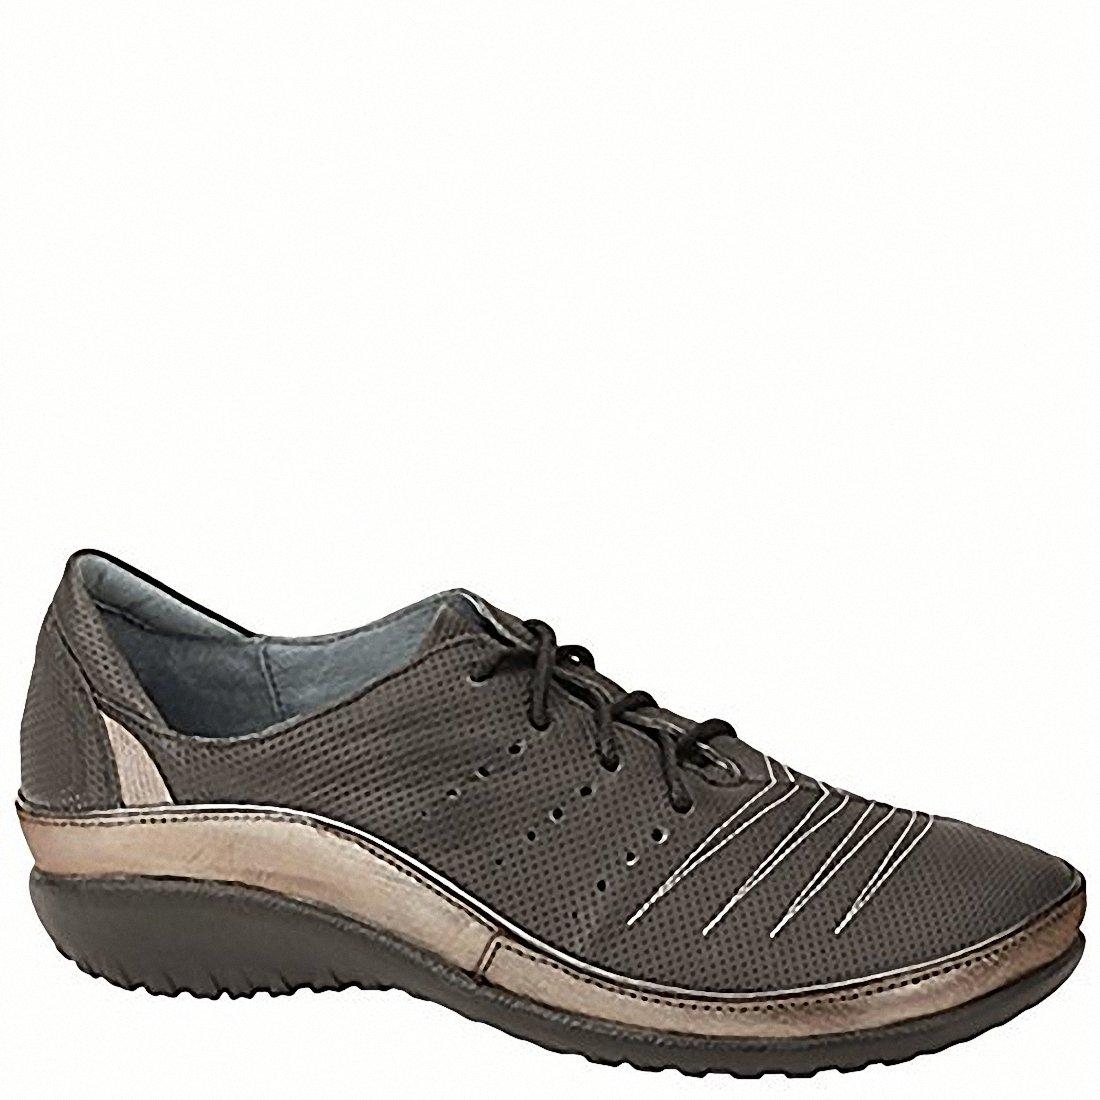 NAOT Kumara Koru Women Flats Shoes B01MDPNSA0 38 M EU|Onyx Lthr/Silver Threads Lthr